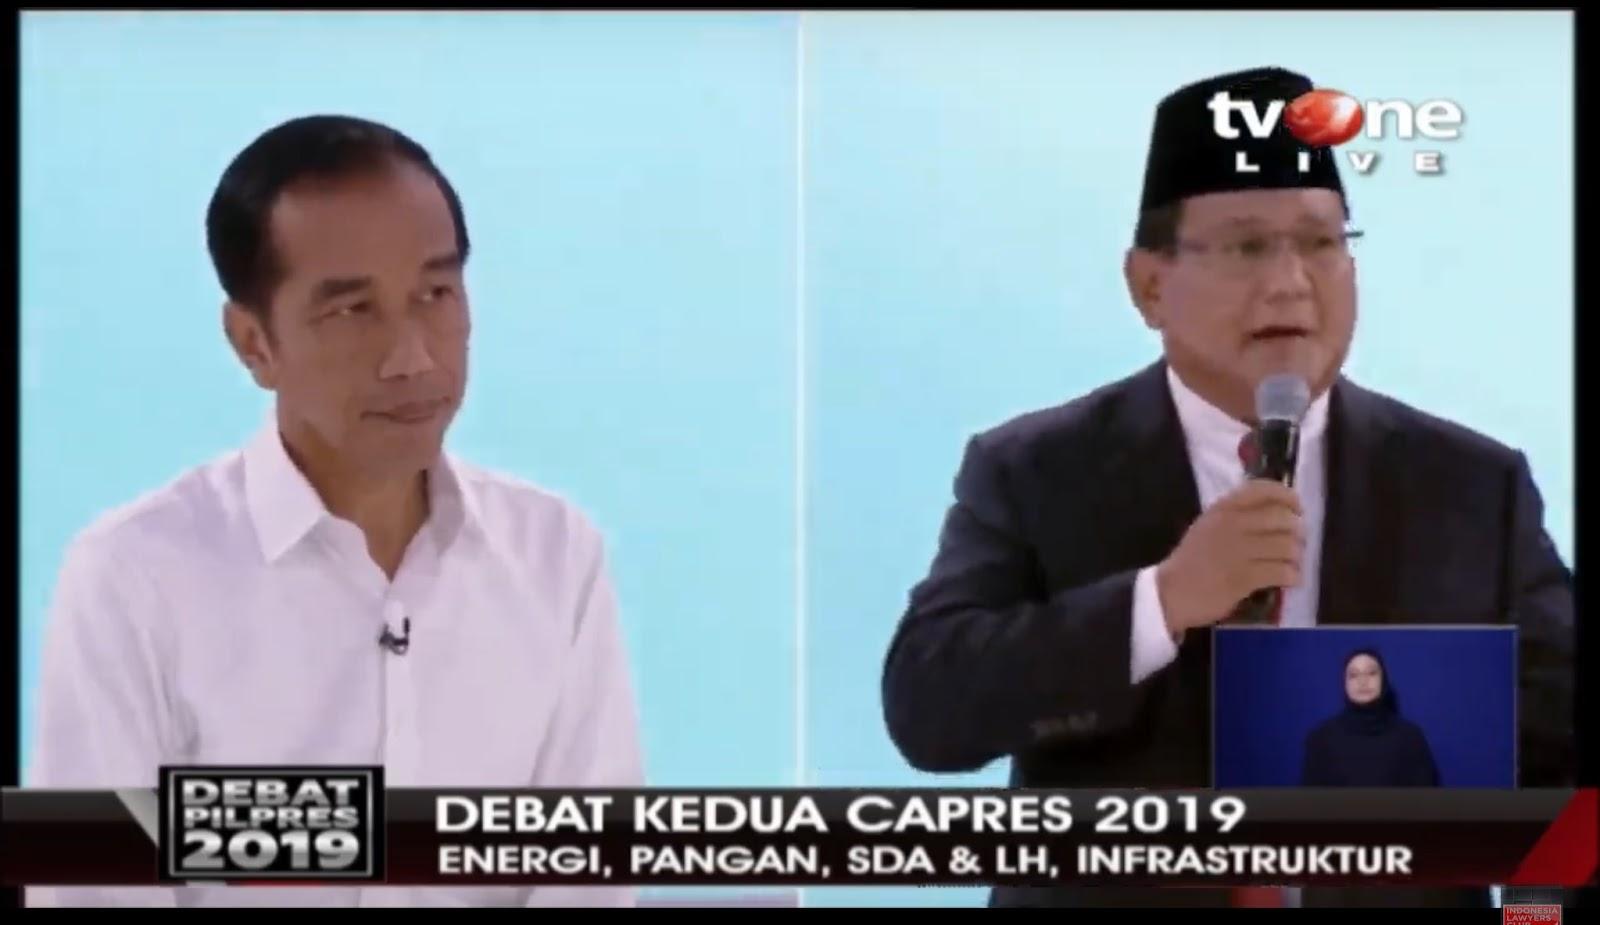 Prabowo: Beberapa Kali Bapak Sampaikan Tak Impor, Ternyata Impor, Mohon Jawaban